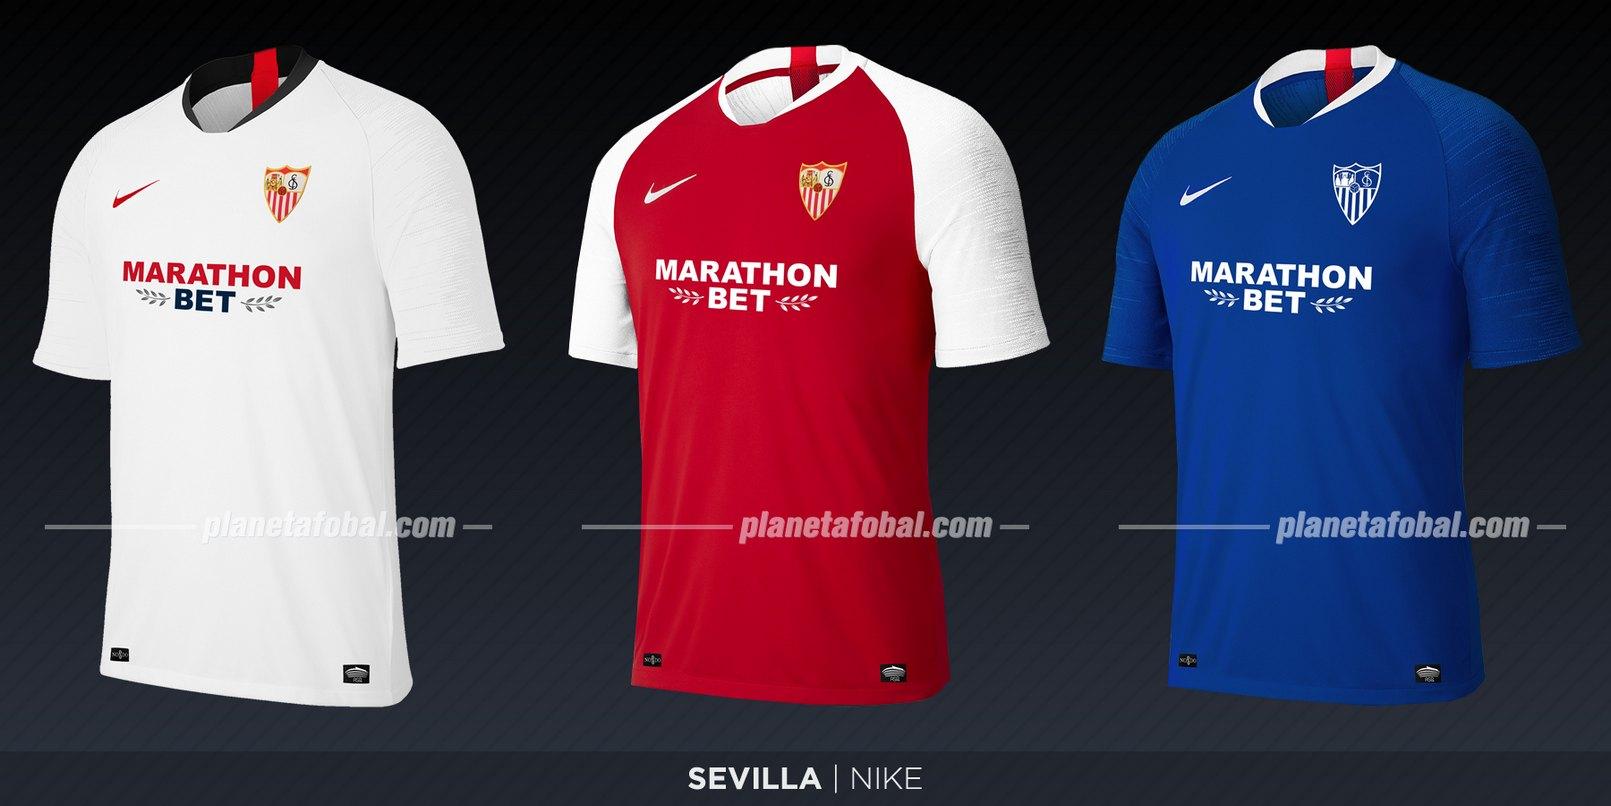 Sevilla (Nike) | Camisetas de LaLiga 2019-2020